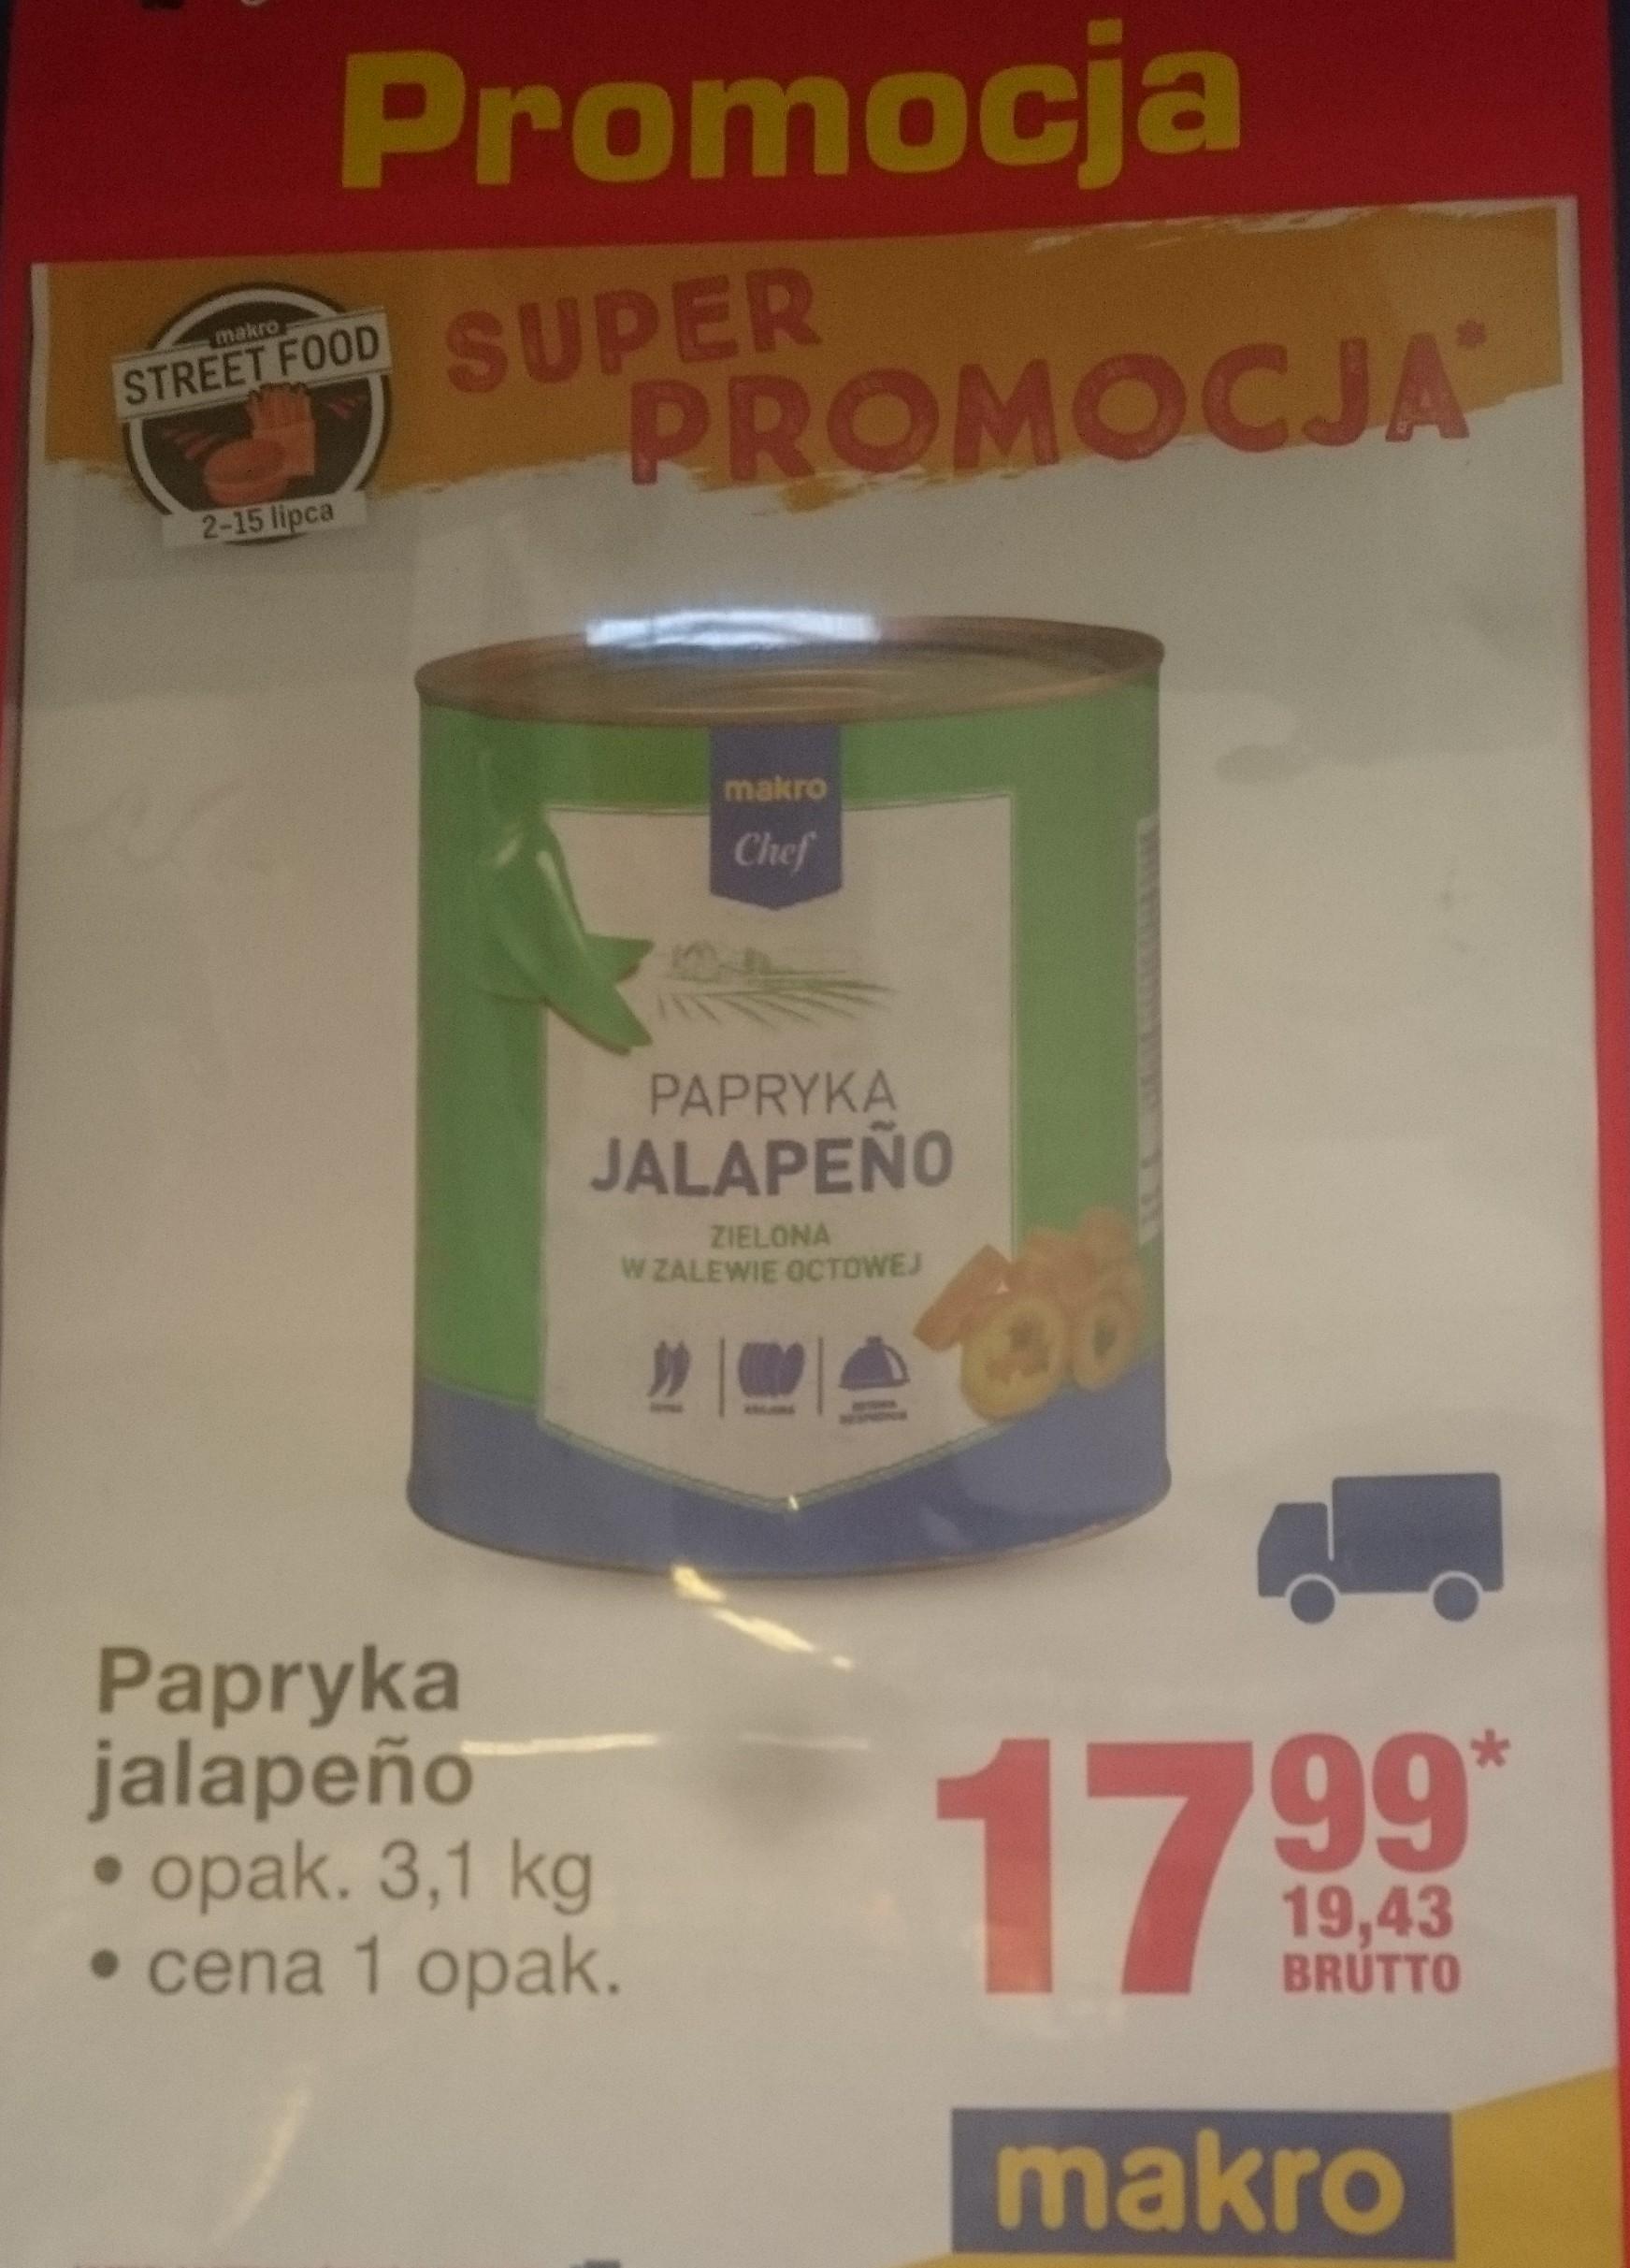 Papryka Jalapeno